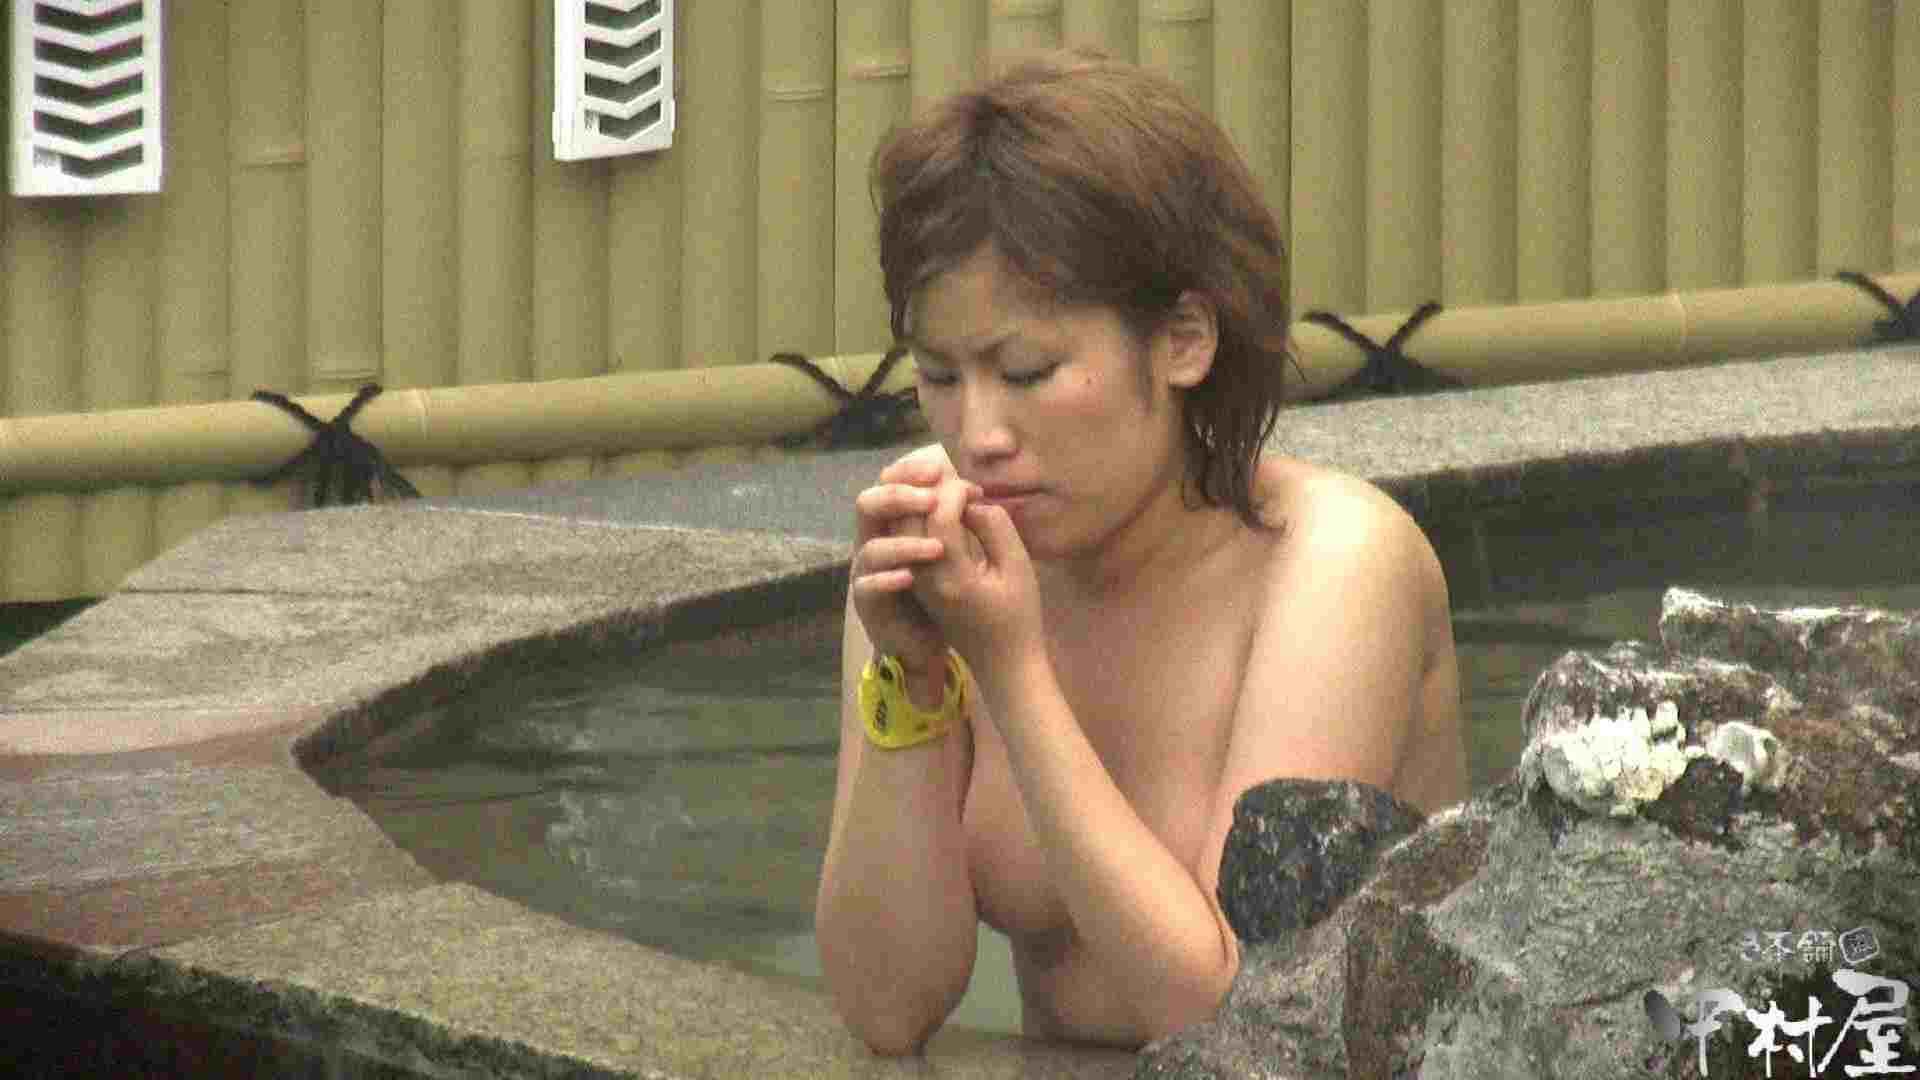 Aquaな露天風呂Vol.918 0  55連発 30